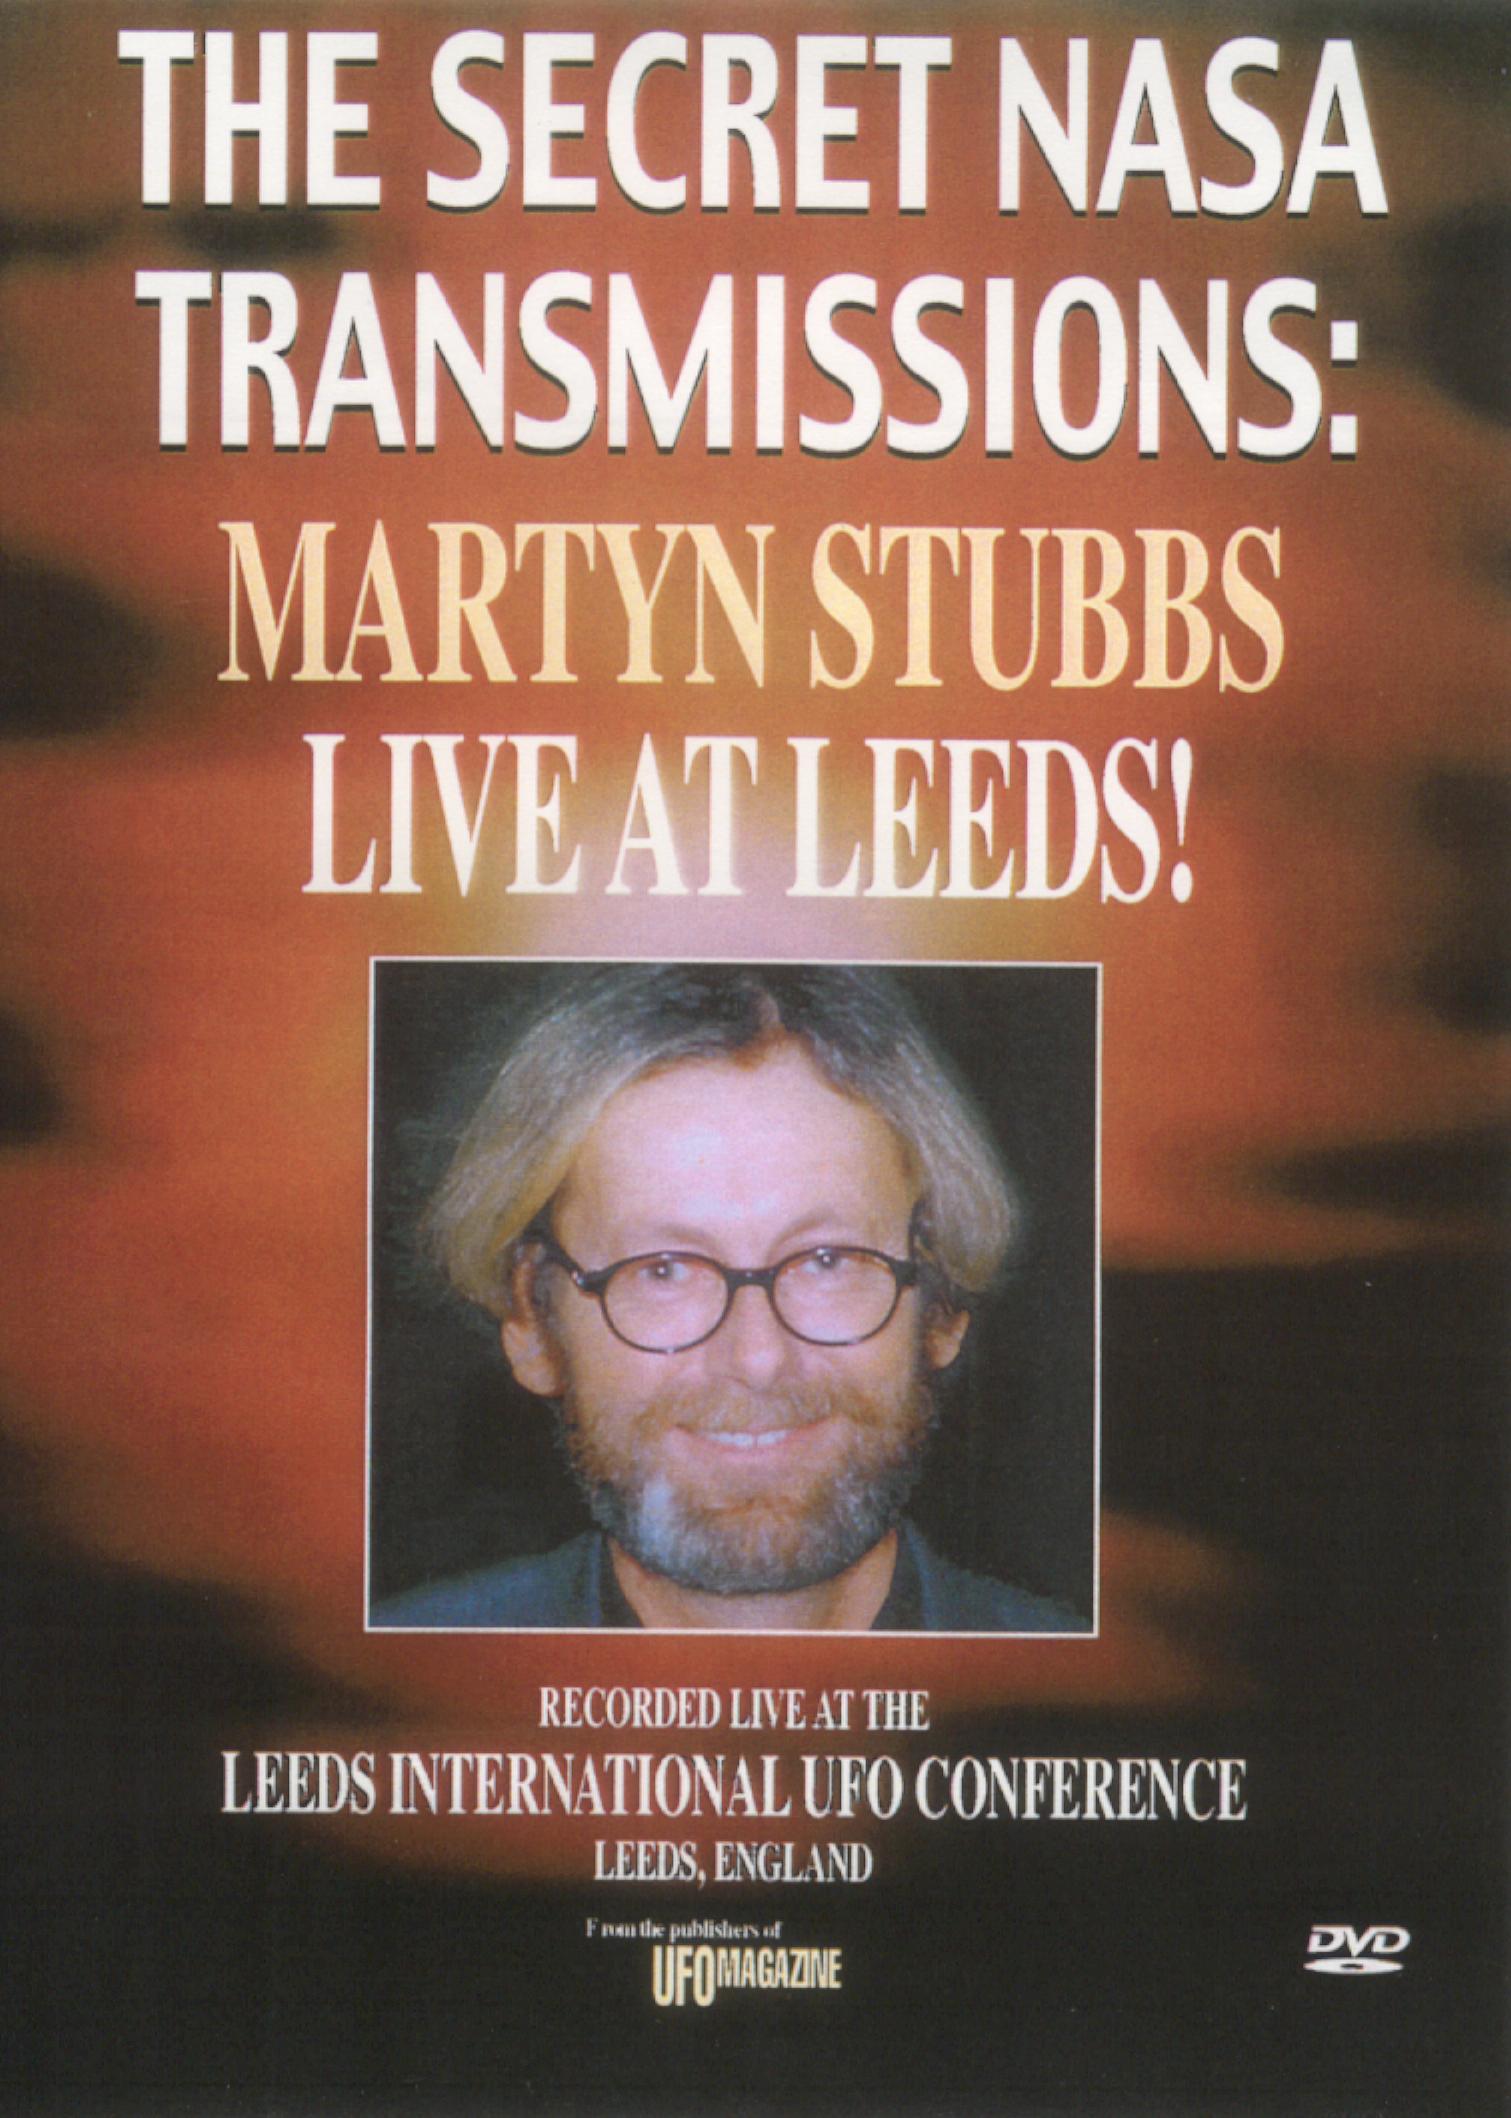 The Secret NASA Transmissions: Martyn Stubbs Live at Leeds!